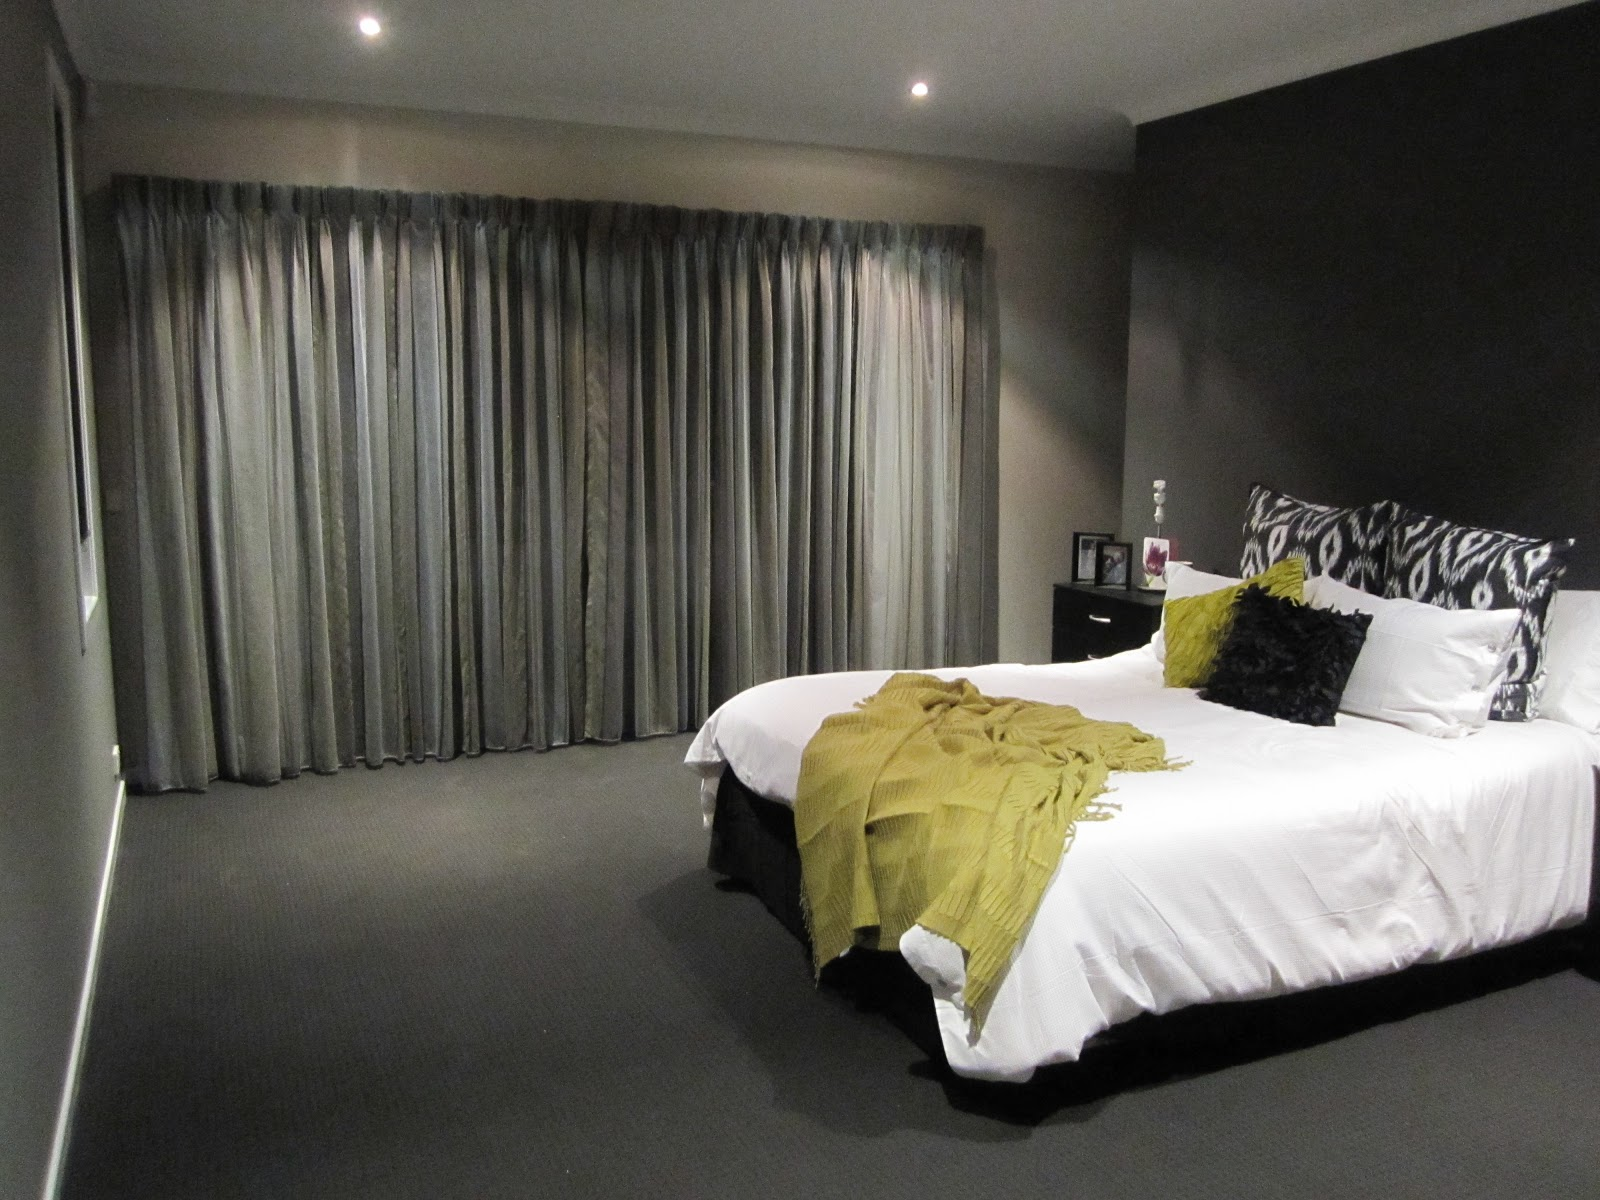 View In Gallery Idea Langsir Untuk Bilik Tidur Moden Yang Menenangkan